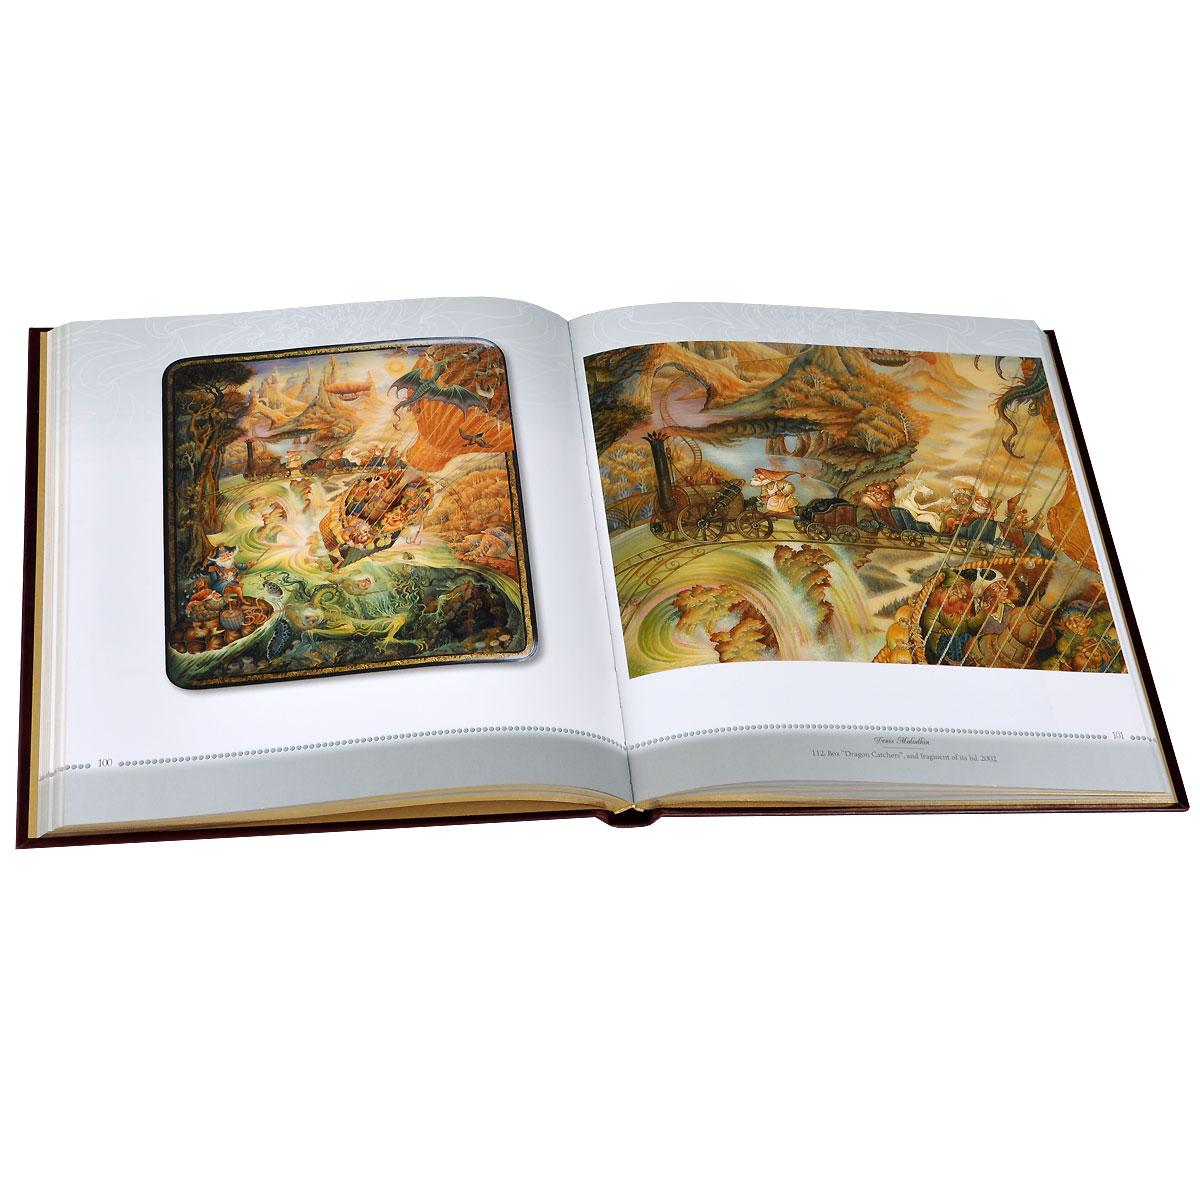 Russian Lacquer Painting: 21st Century (подарочное издание)